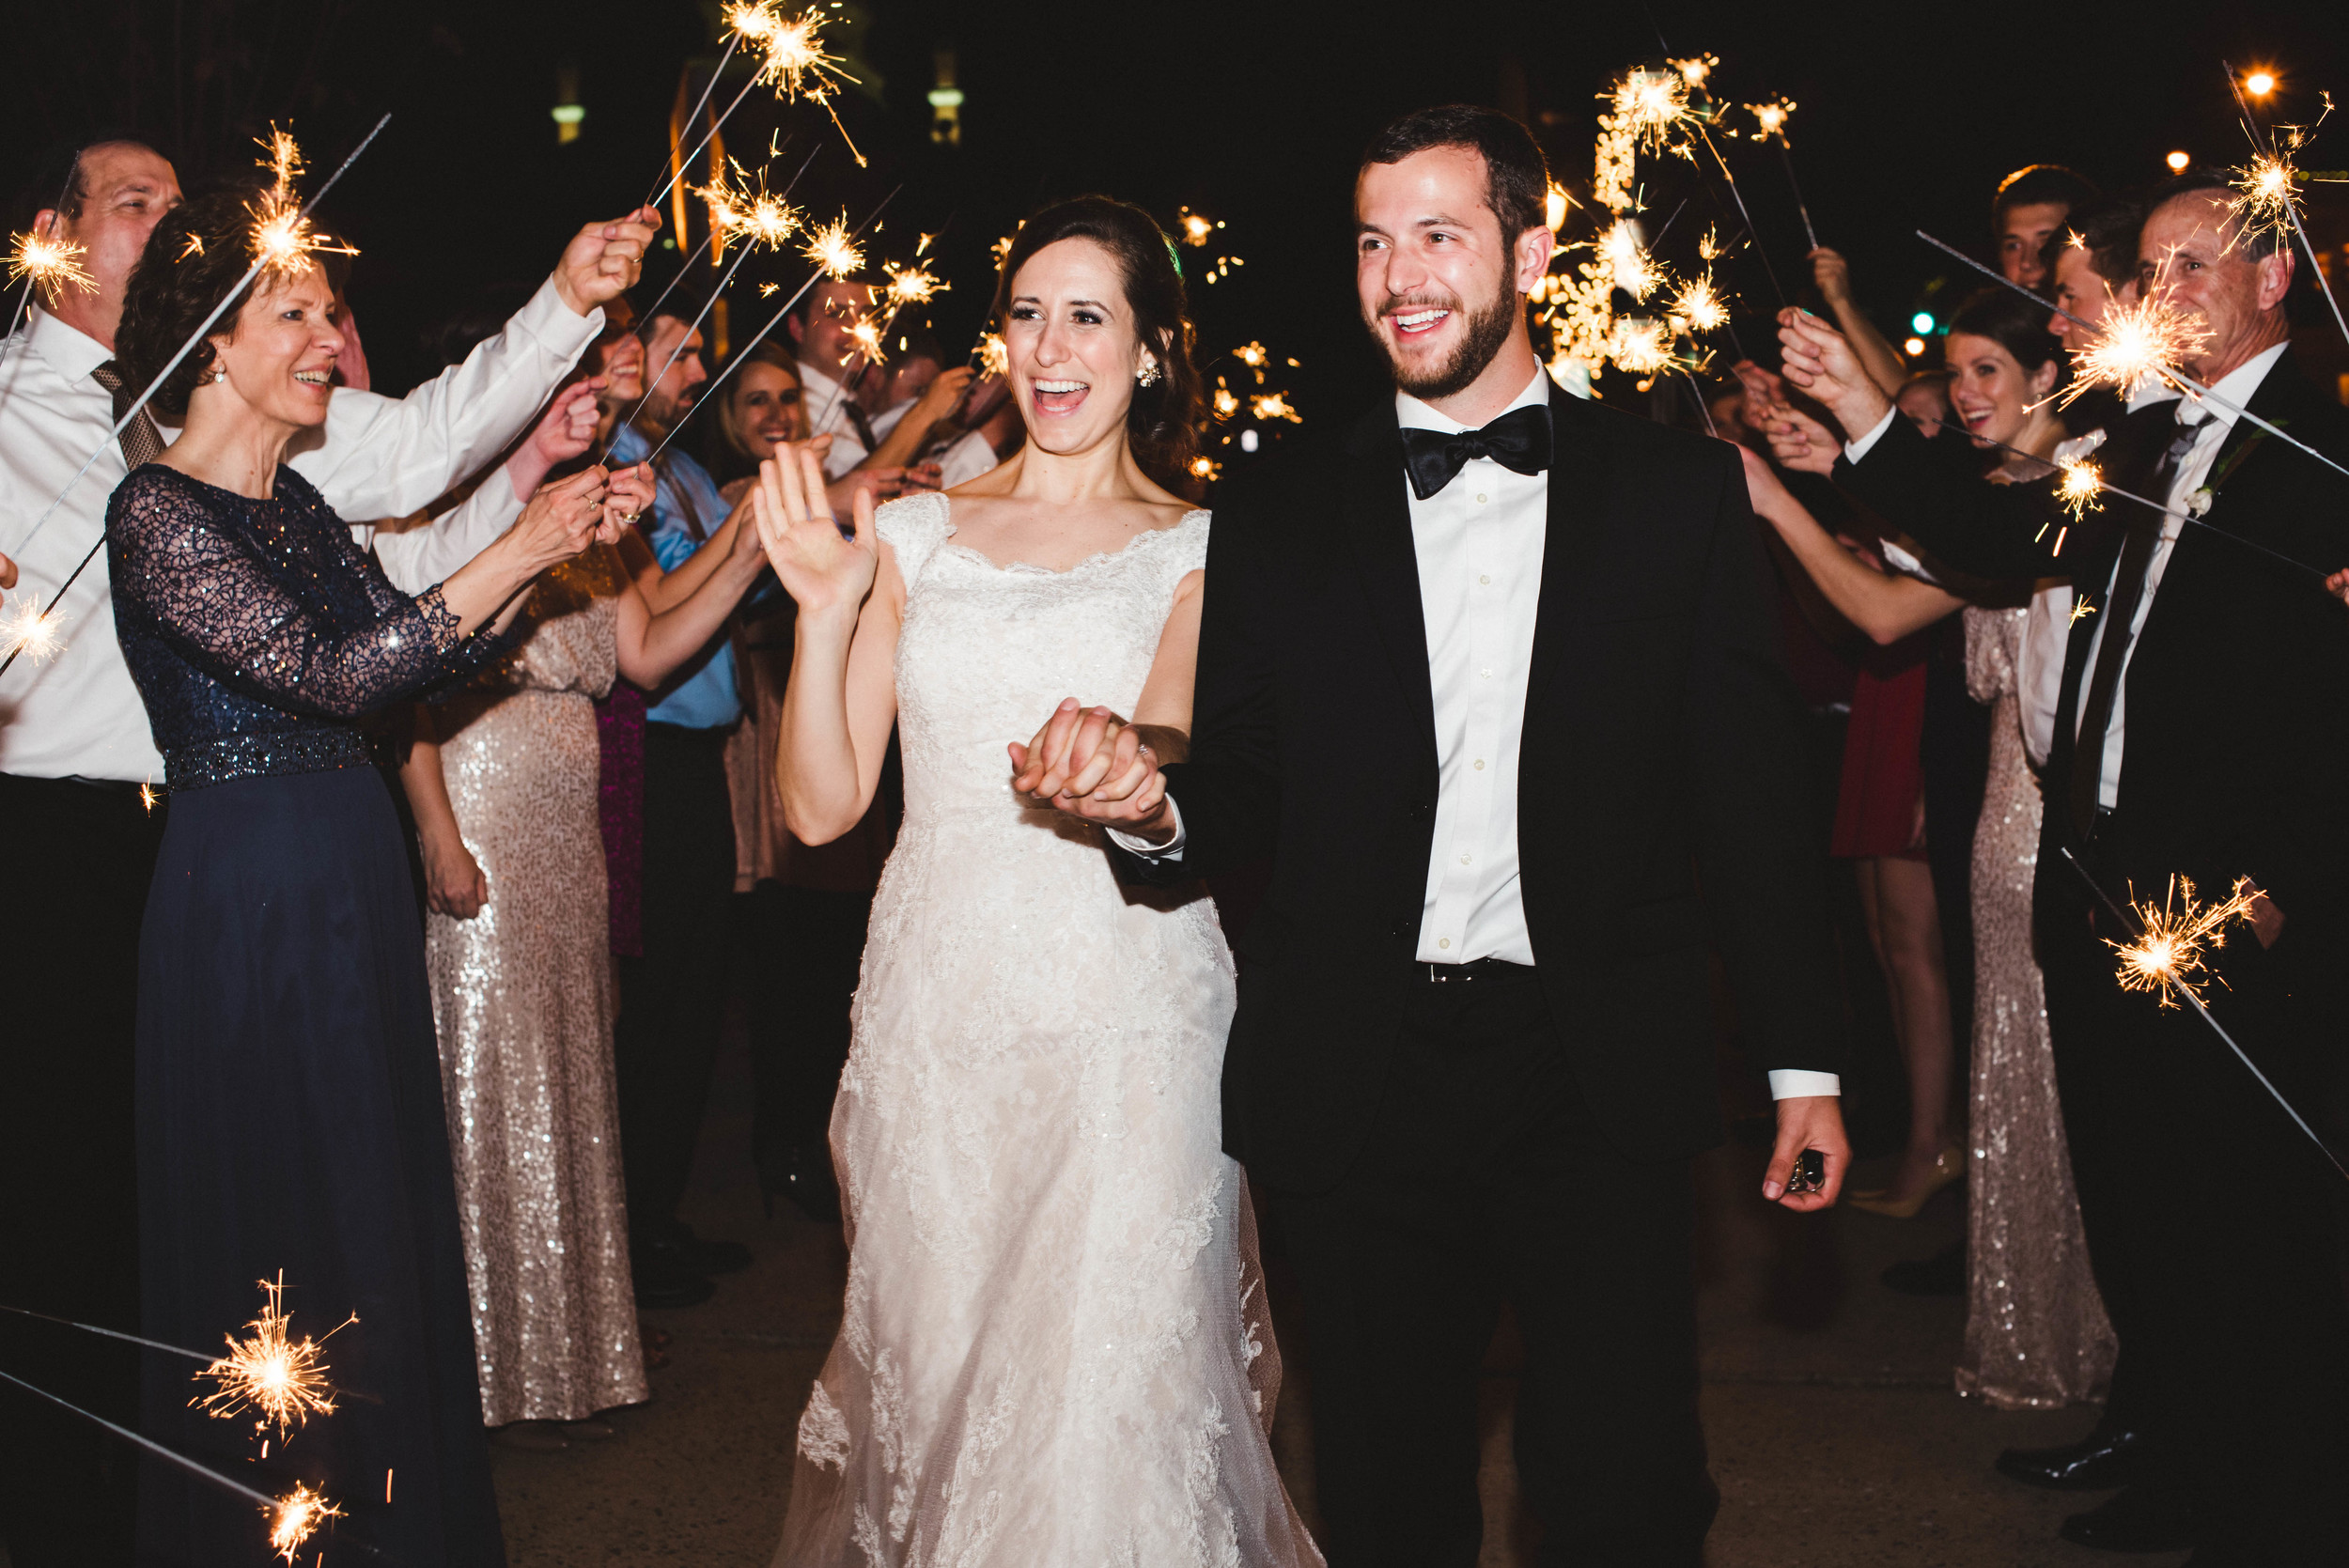 Souther wedding-16.jpg